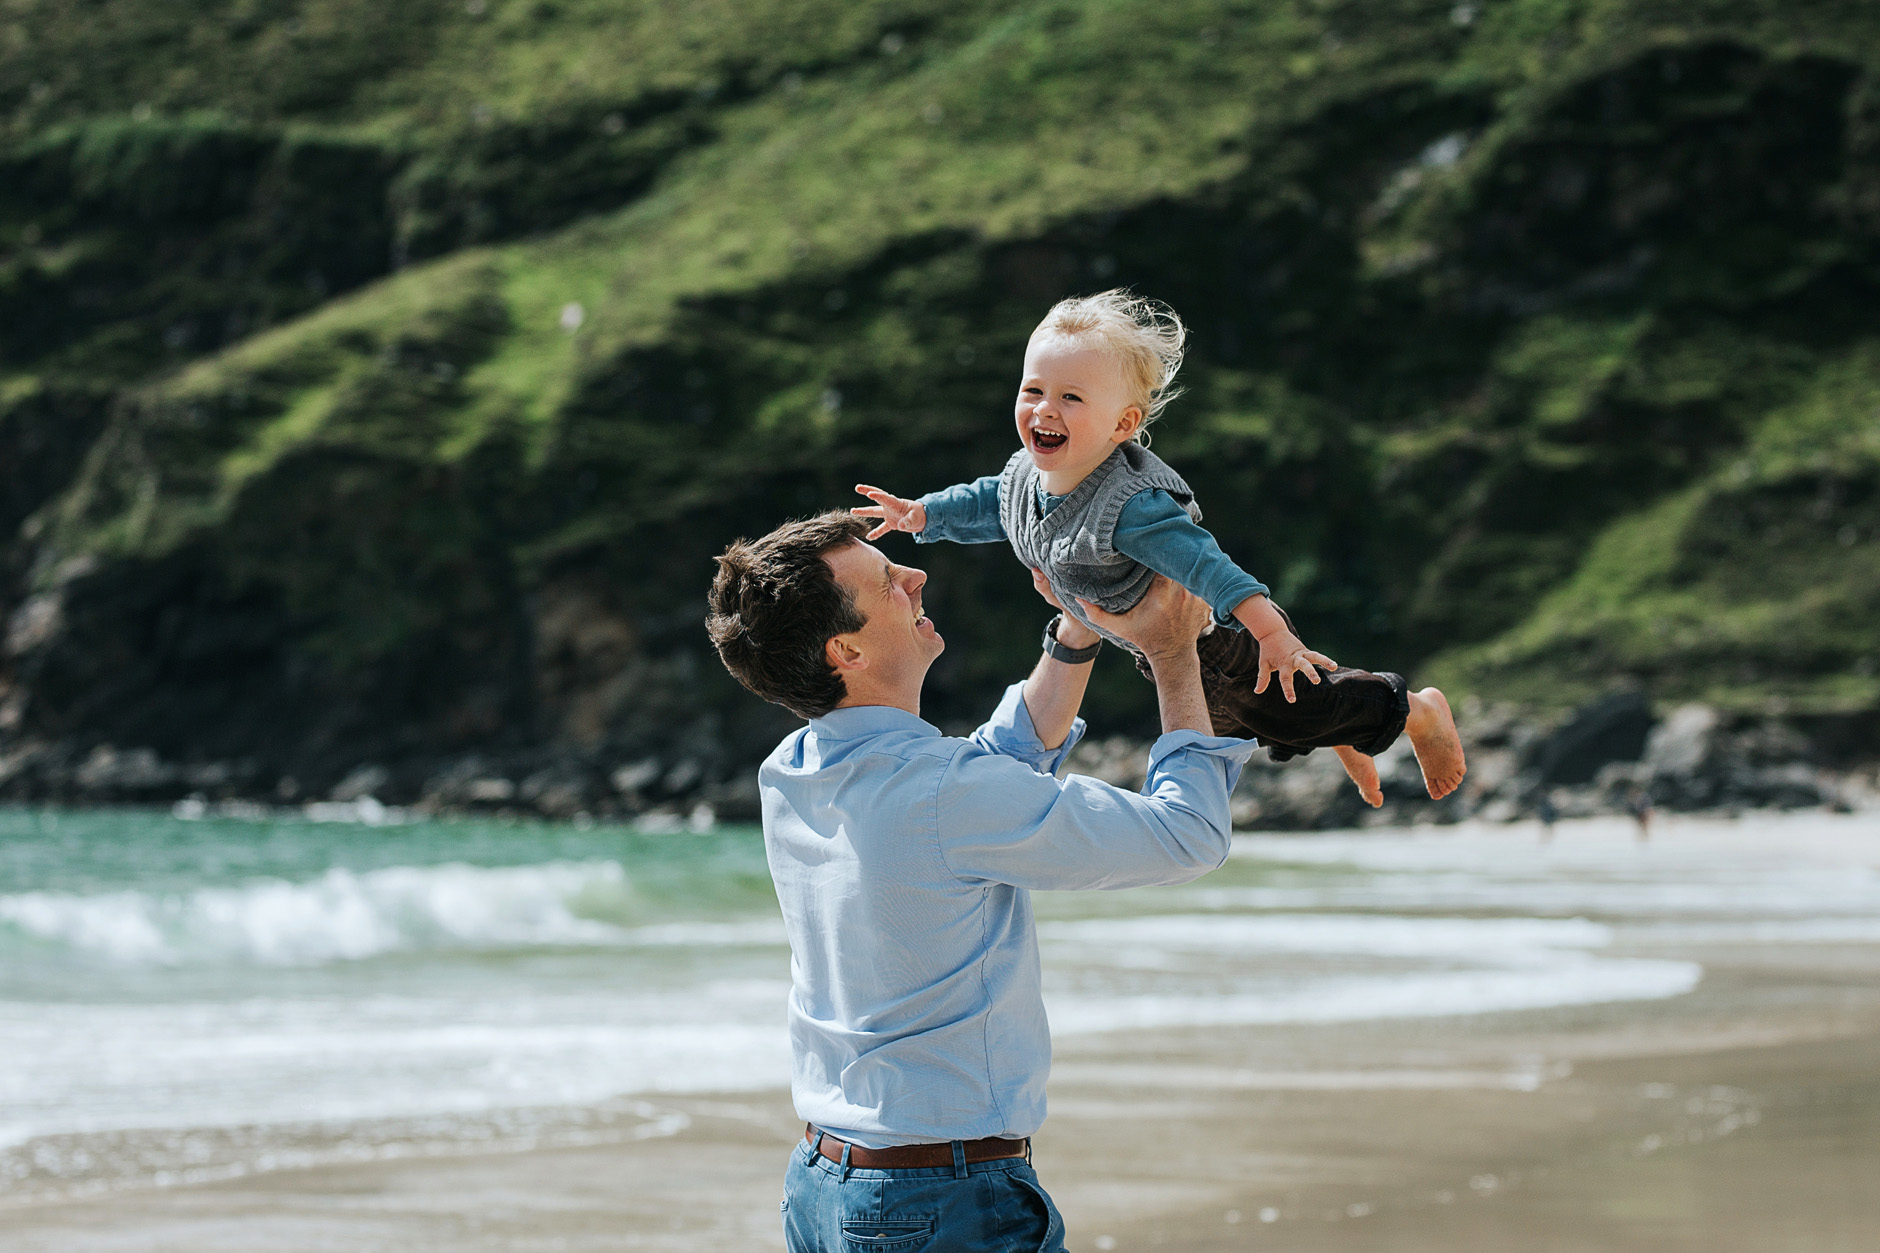 stunning-beach-family-vacation-photoshoot-achill-island-ireland-0012.jpg